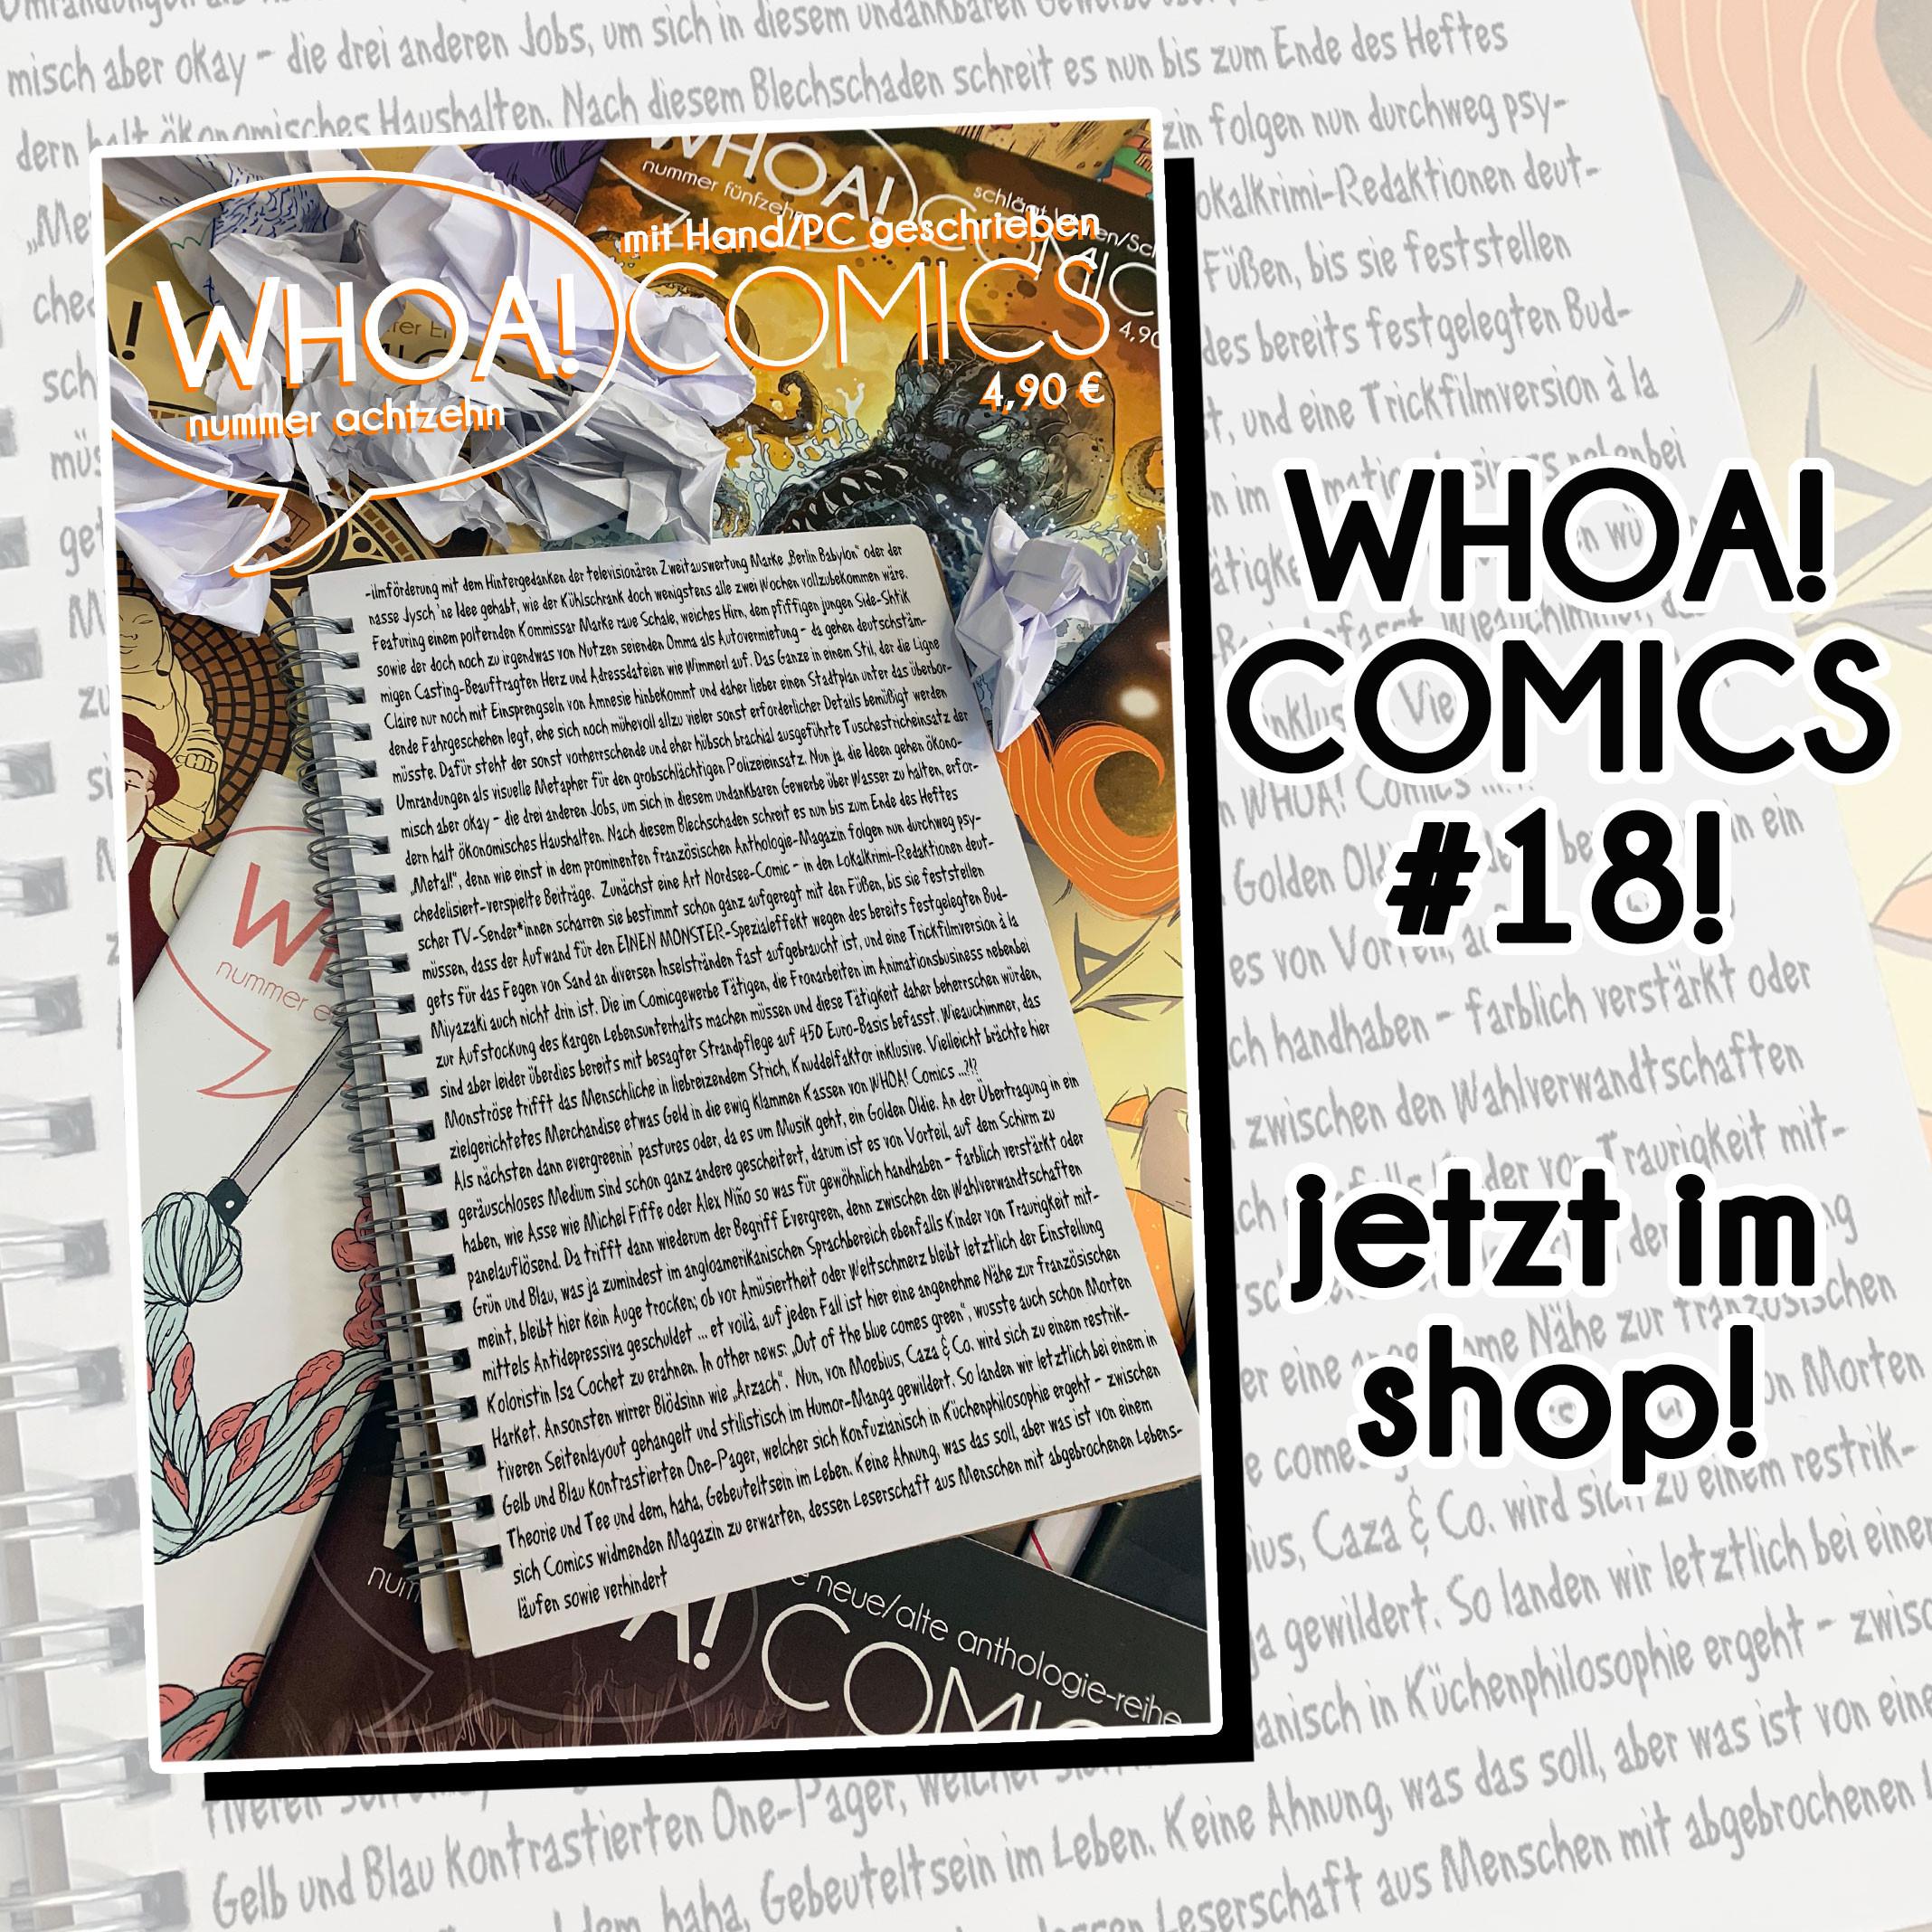 WHOA! COMICS #18